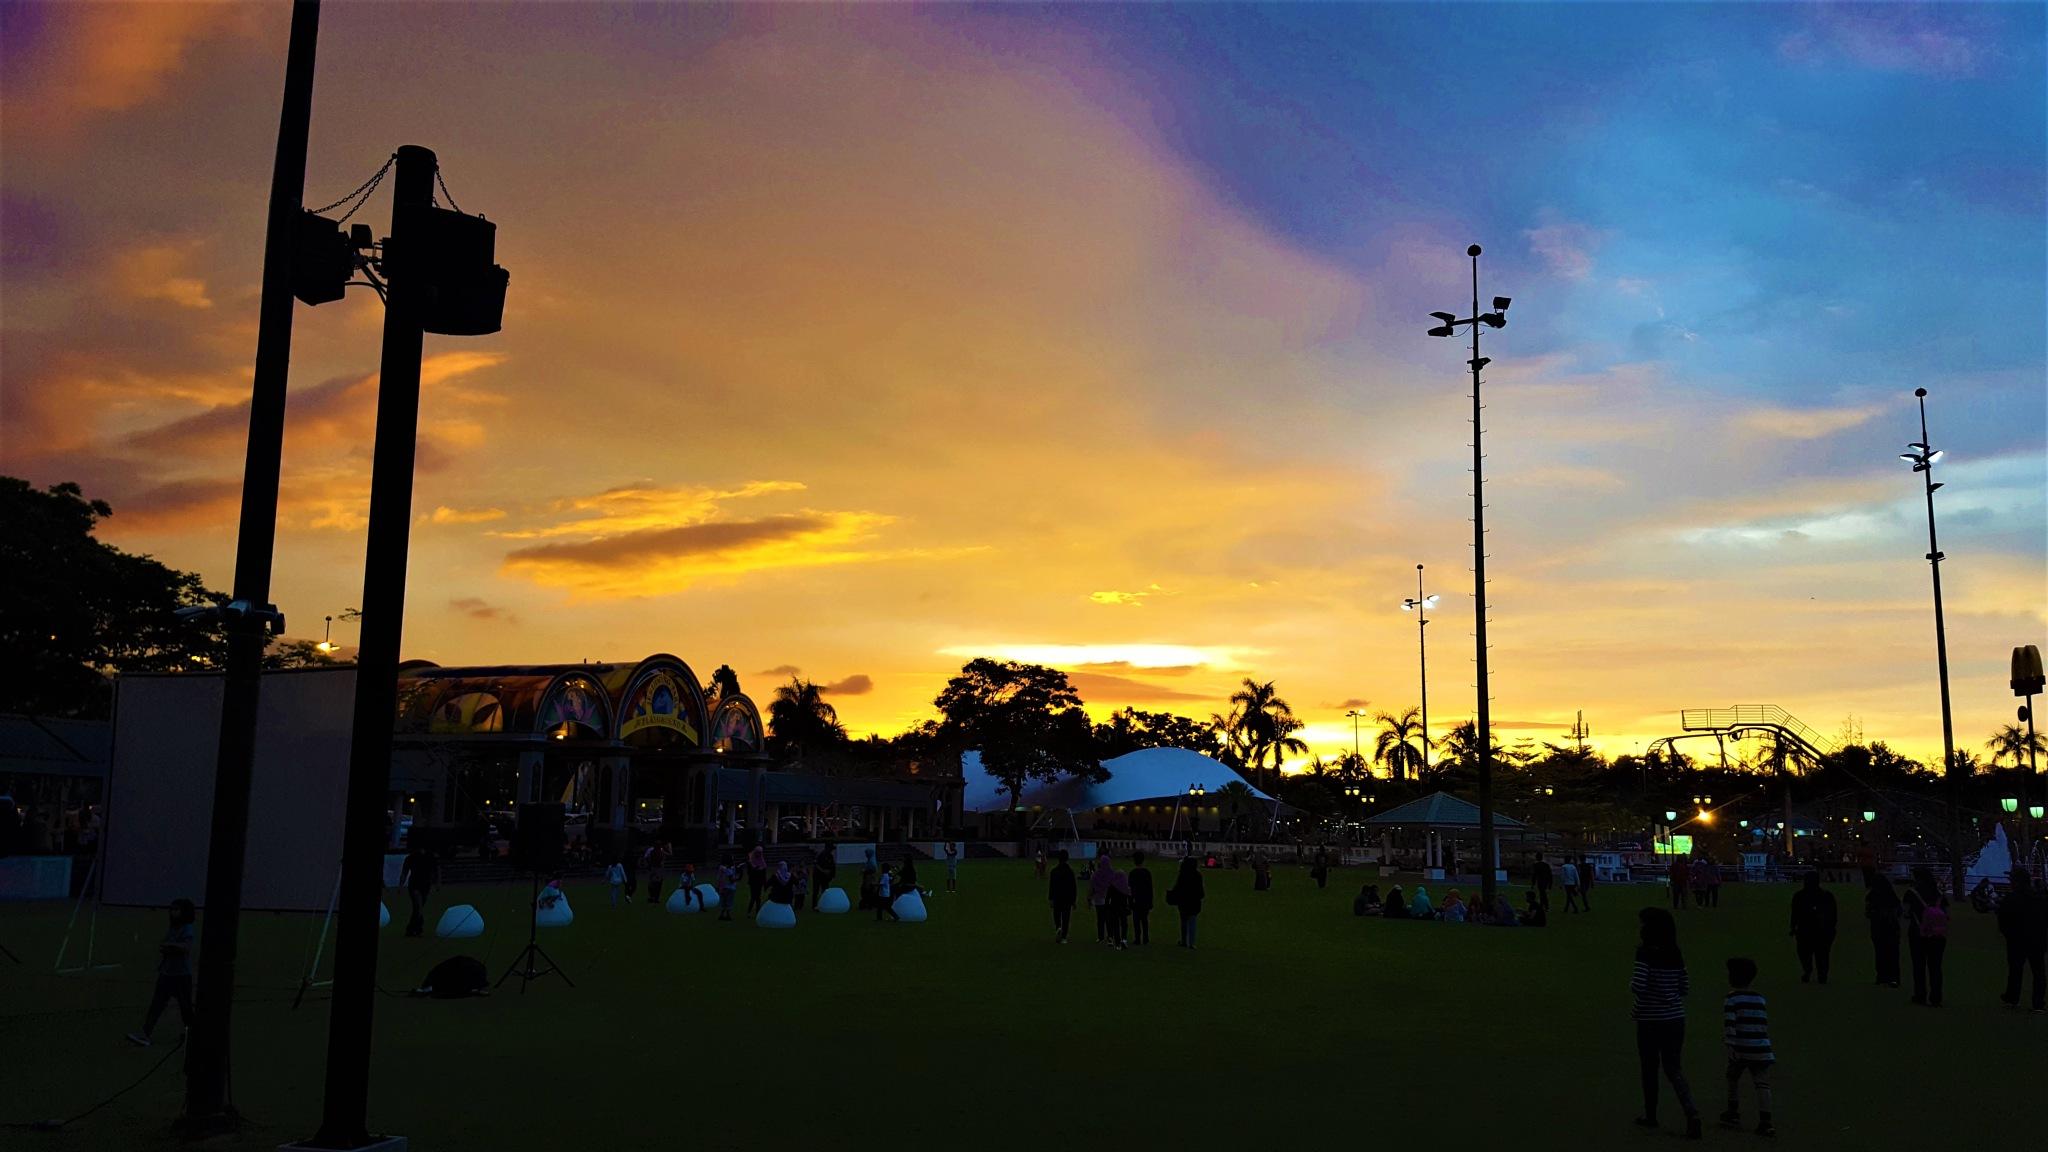 Pastel Sky at Jerudong Park by Syiqah A.